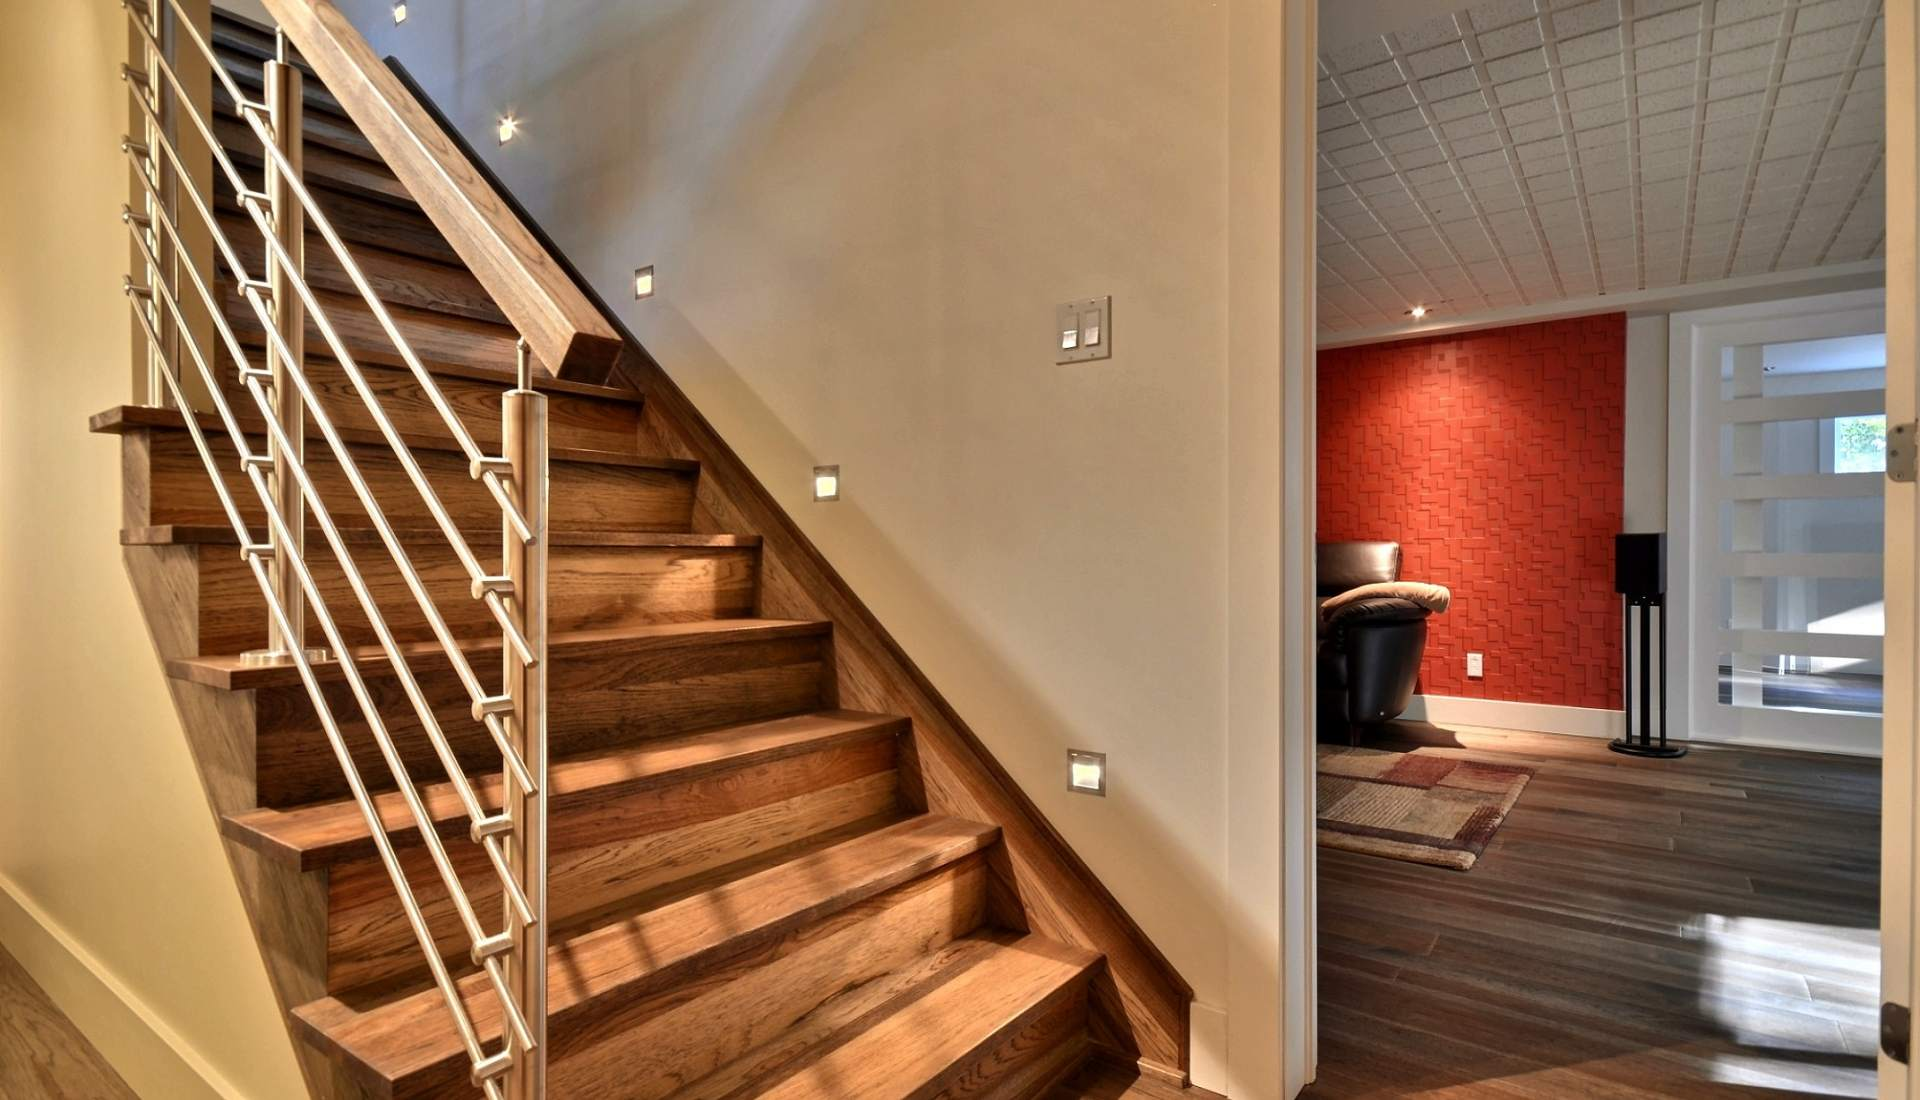 david gilbert escaliers bois et m tal photos 2. Black Bedroom Furniture Sets. Home Design Ideas